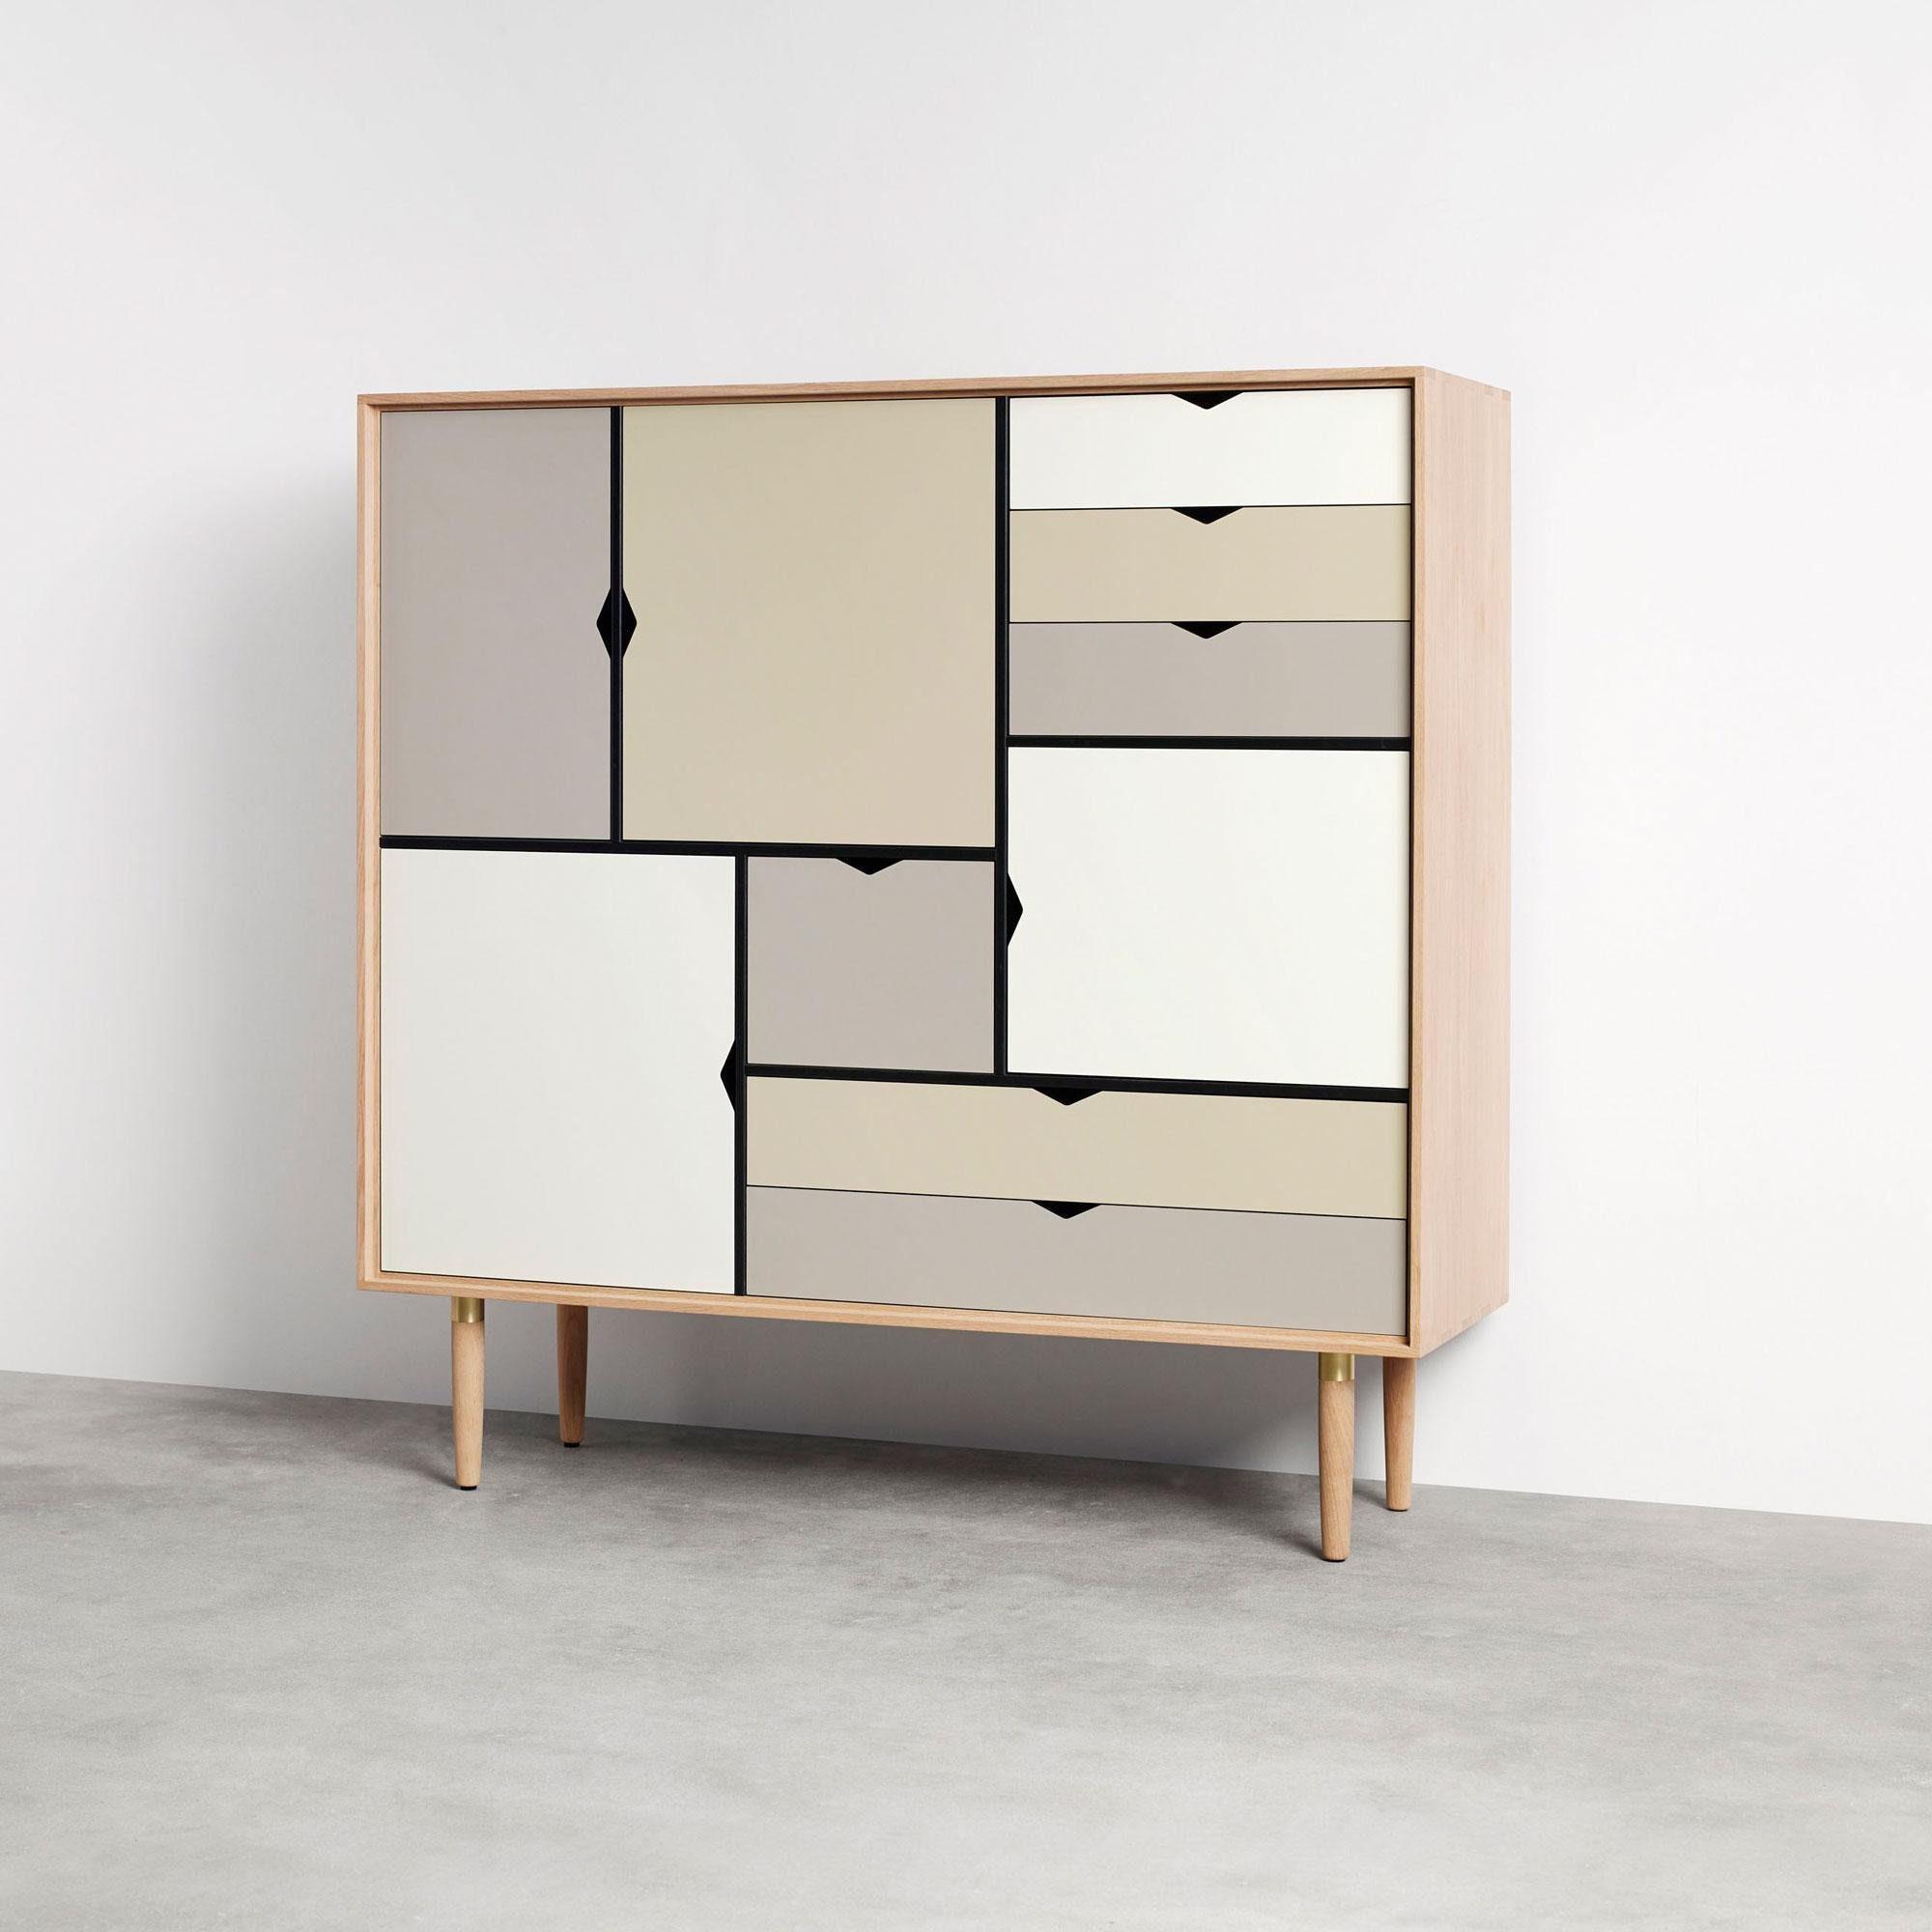 Andersen Furniture S3 Cupboard Multicolored | Andersen Furniture ...